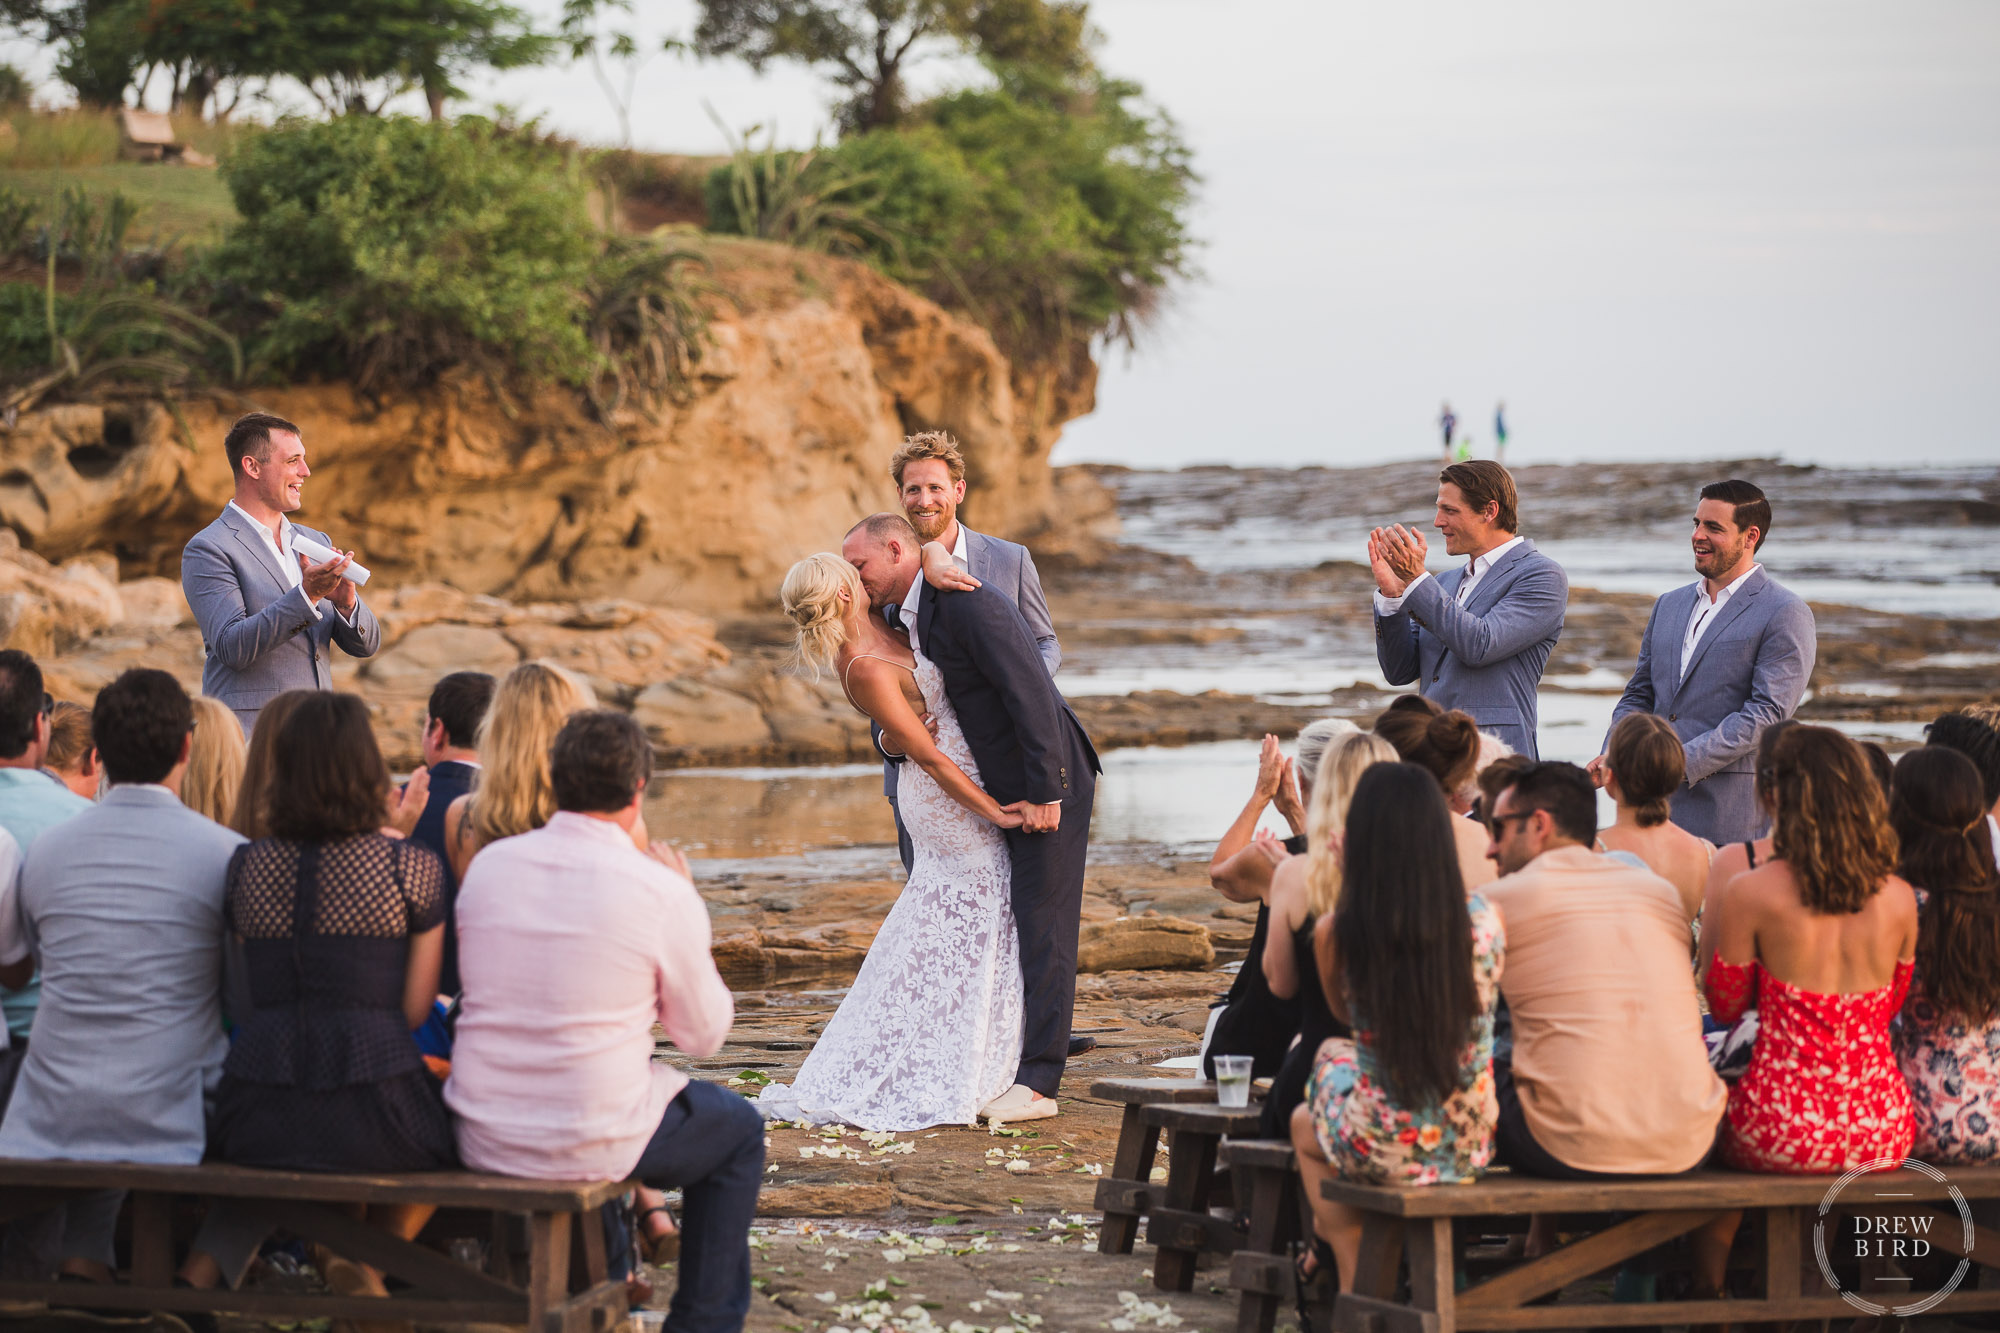 Intimate wedding ceremony on tidal rocks on the beach at sunset. Rancho Santana Nicaragua destination wedding photographer Drew Bird.